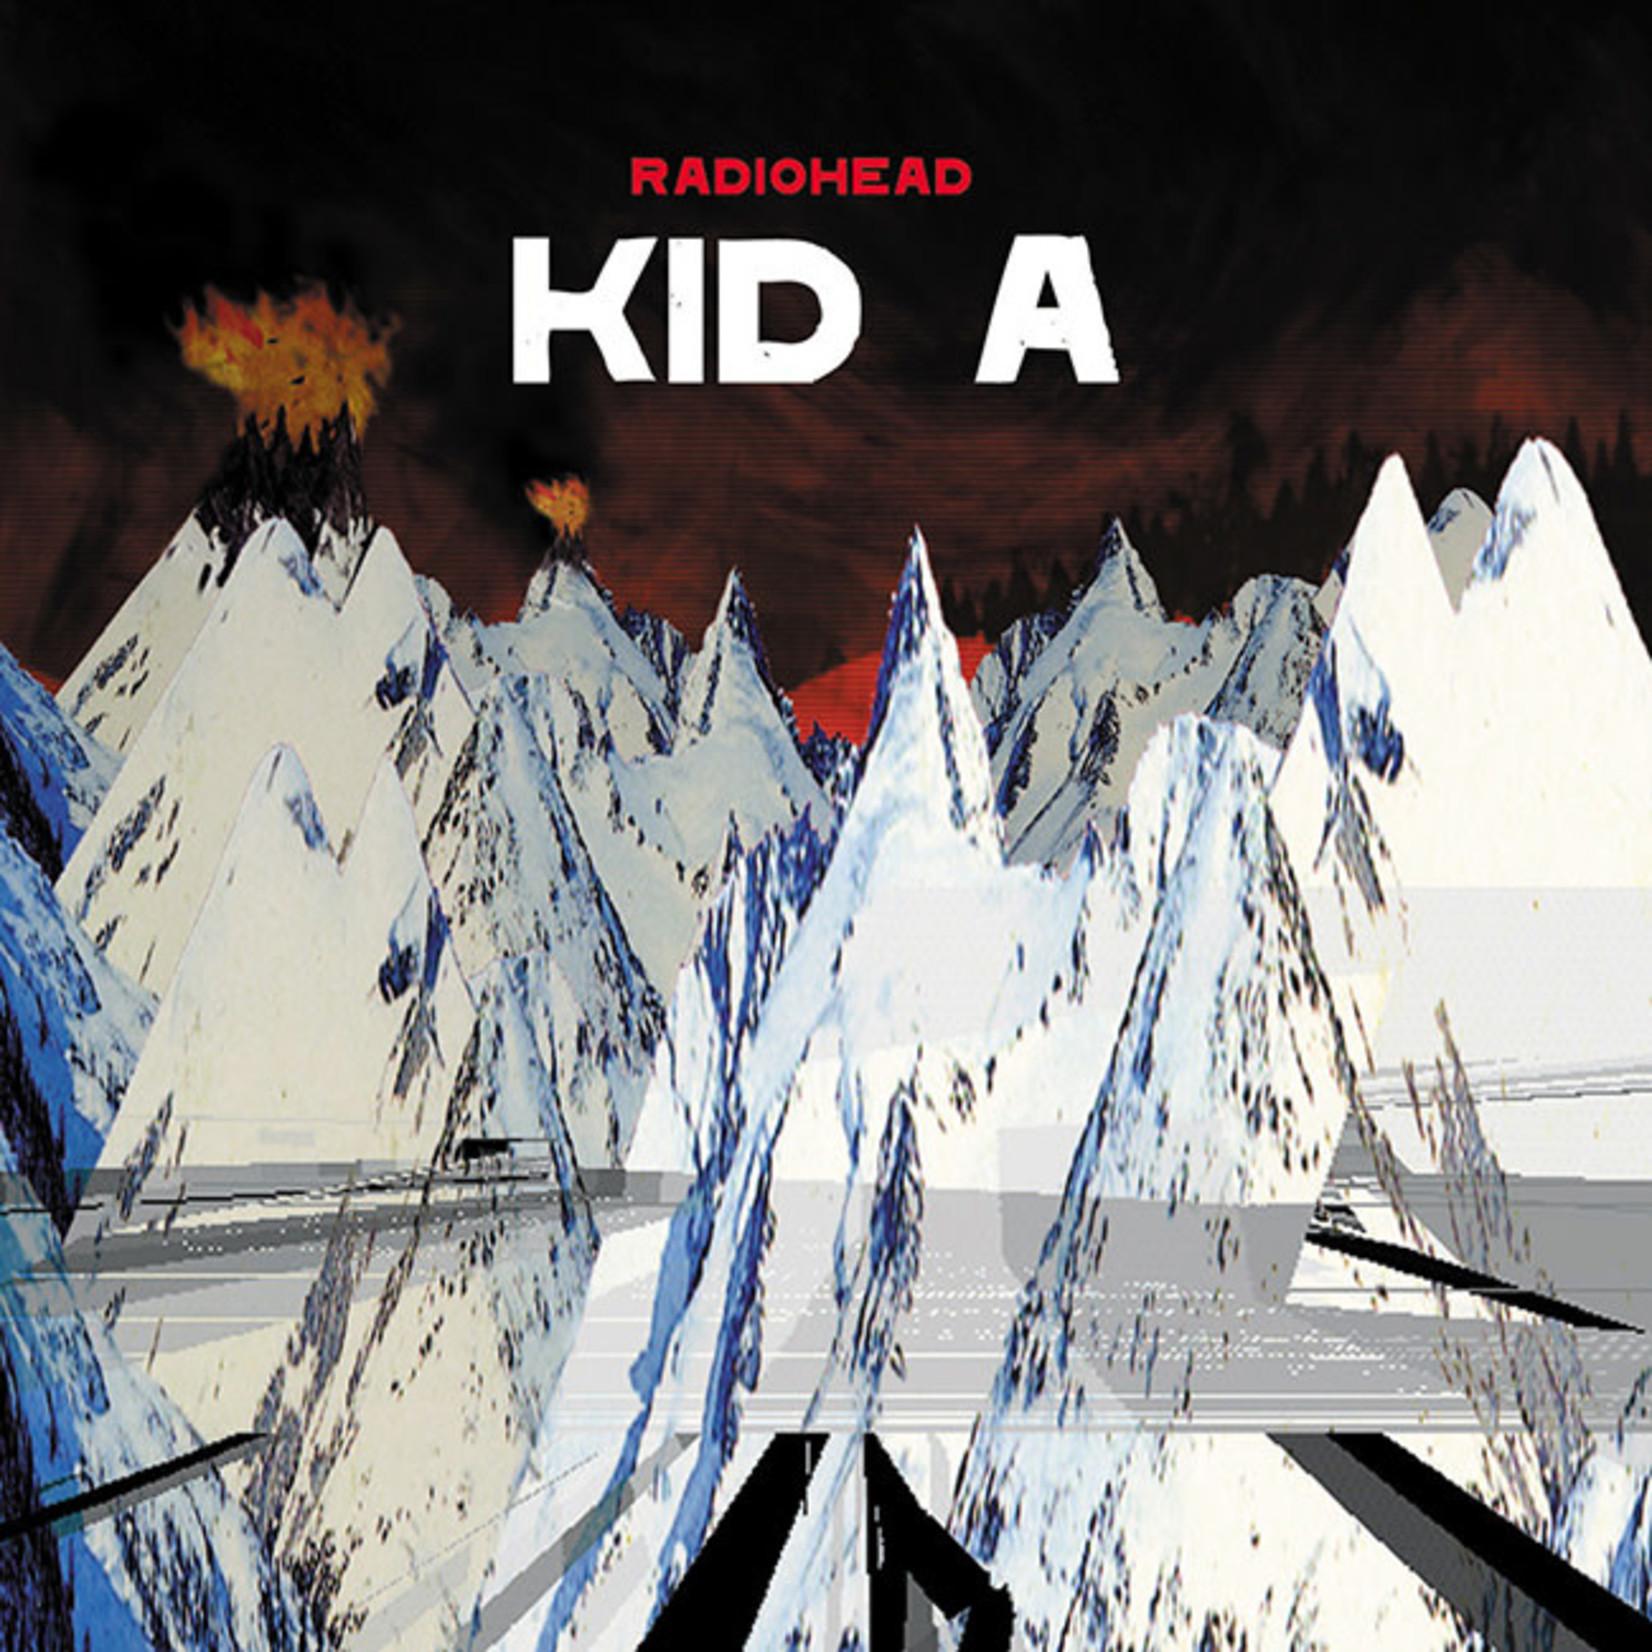 [New] Radiohead: Kid A (2LP)